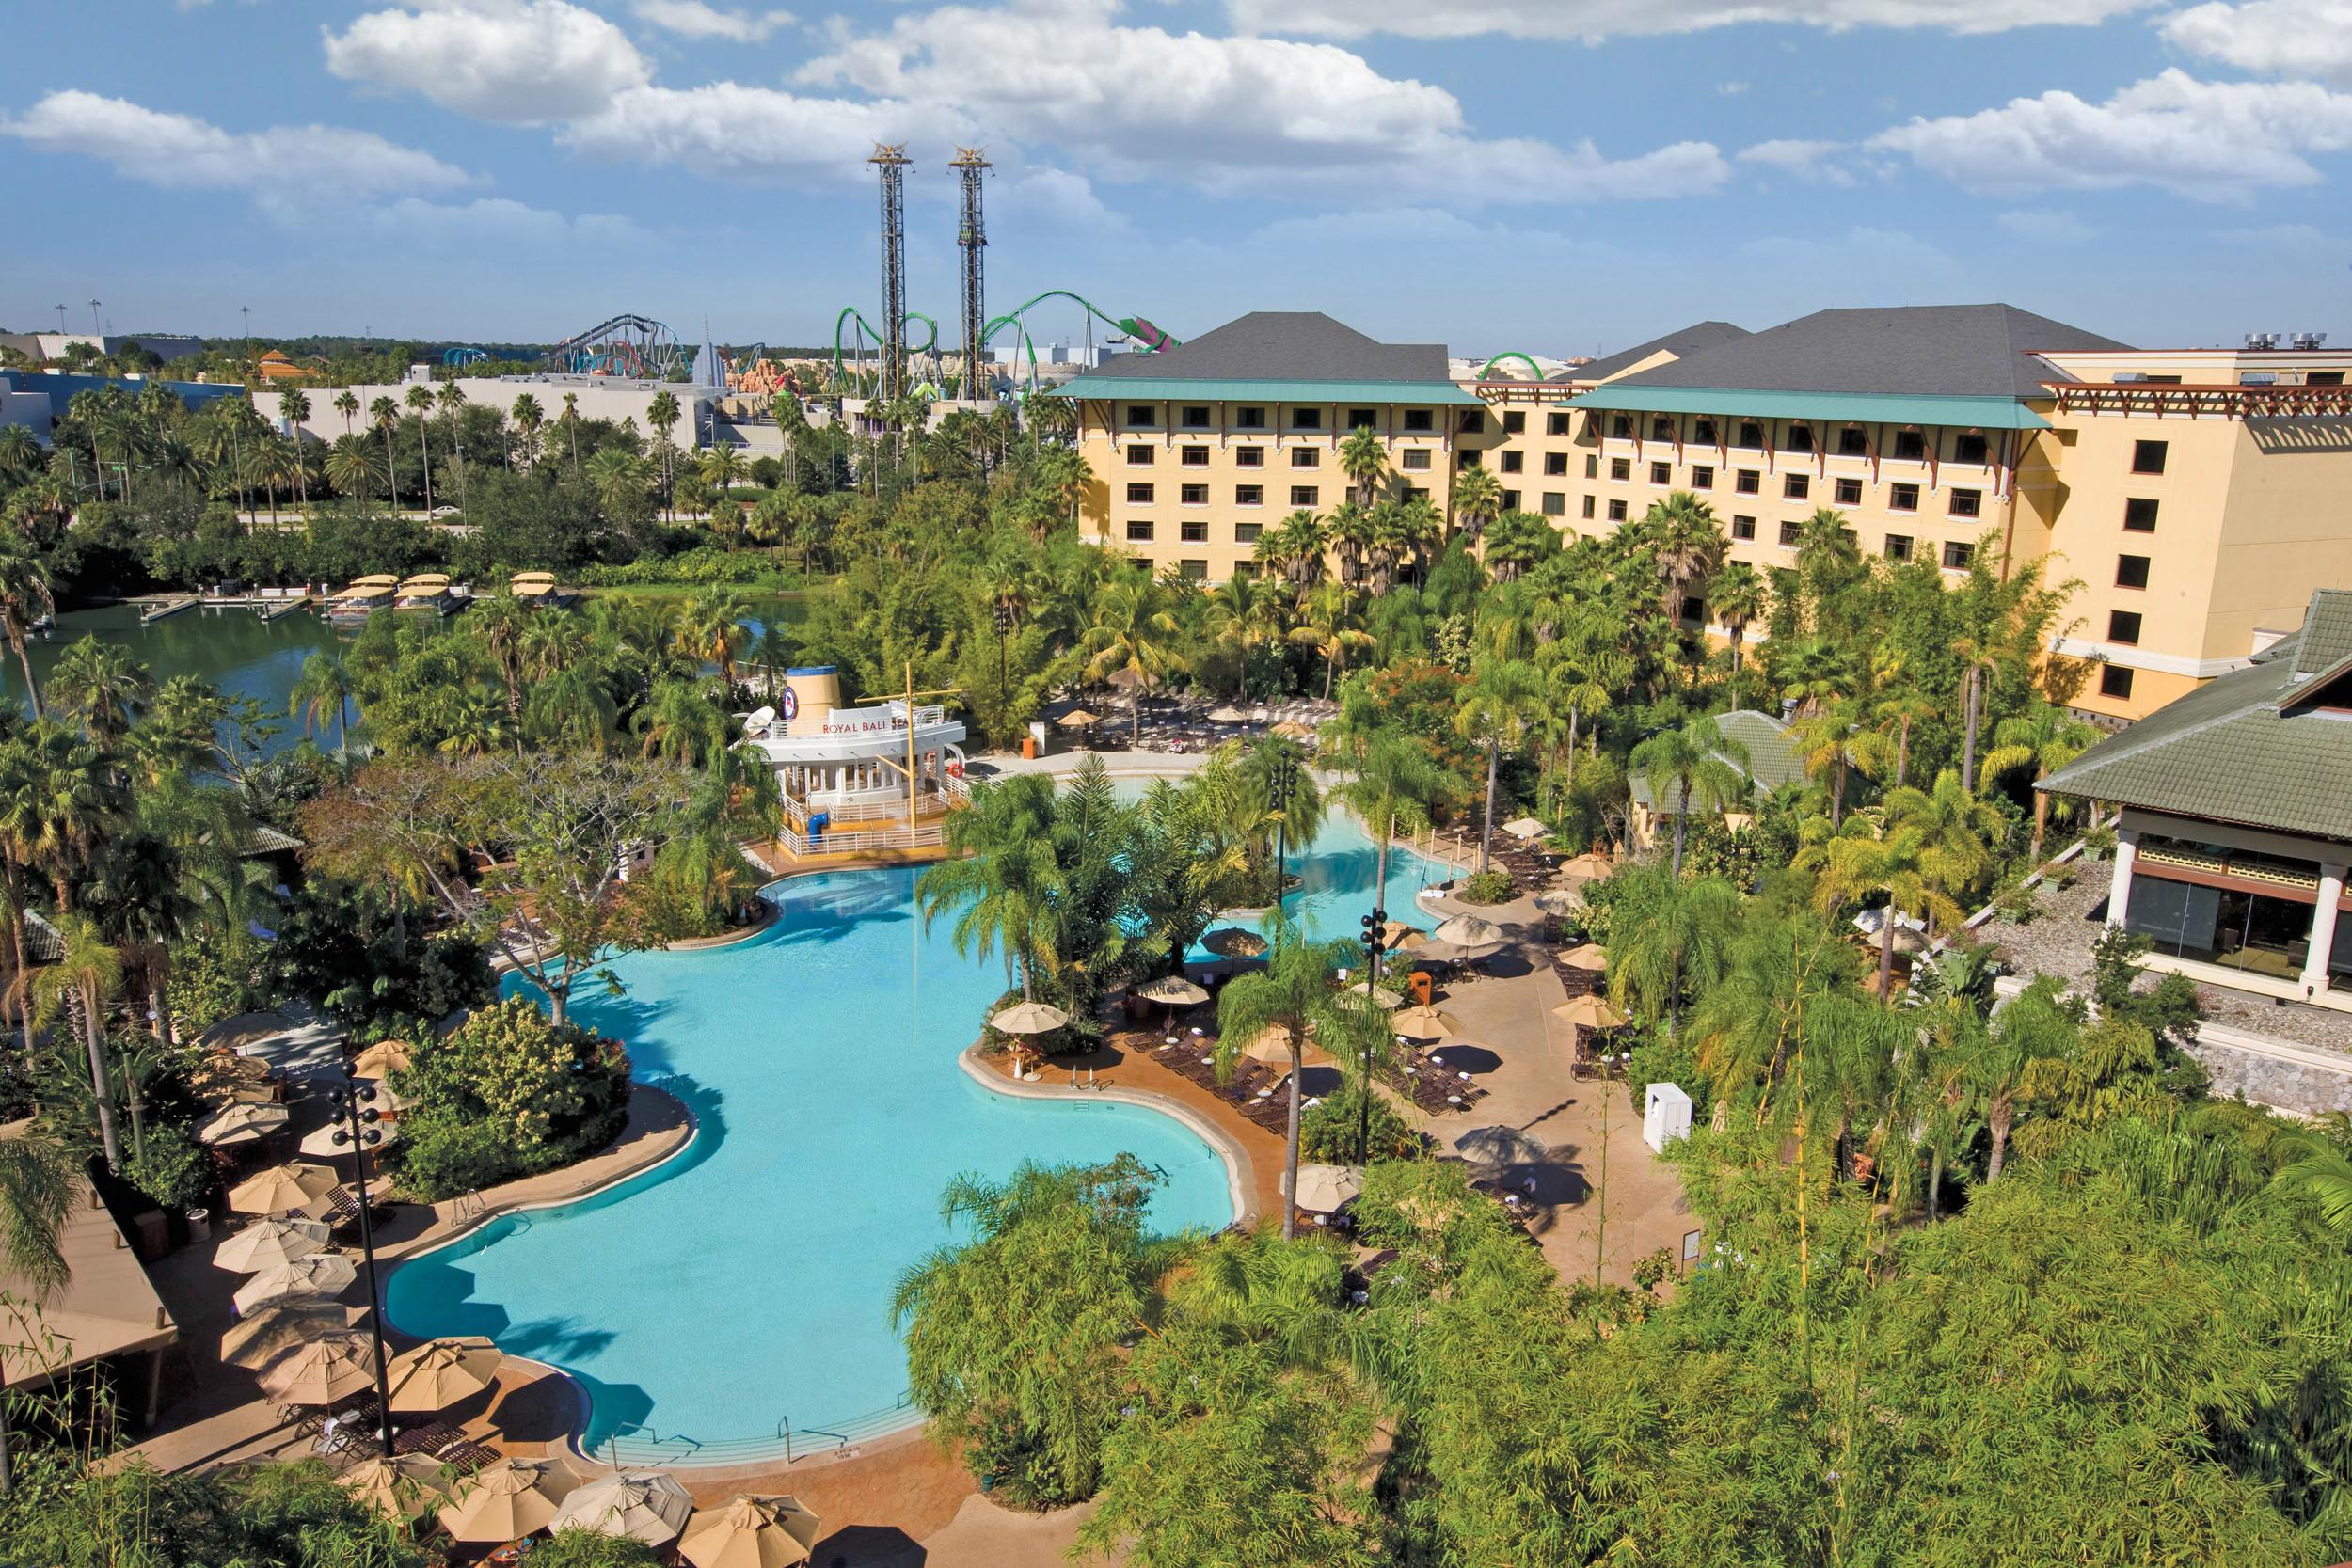 Loews Royal Pacific Resort pool. Image credit: Universal Orlando Resort.